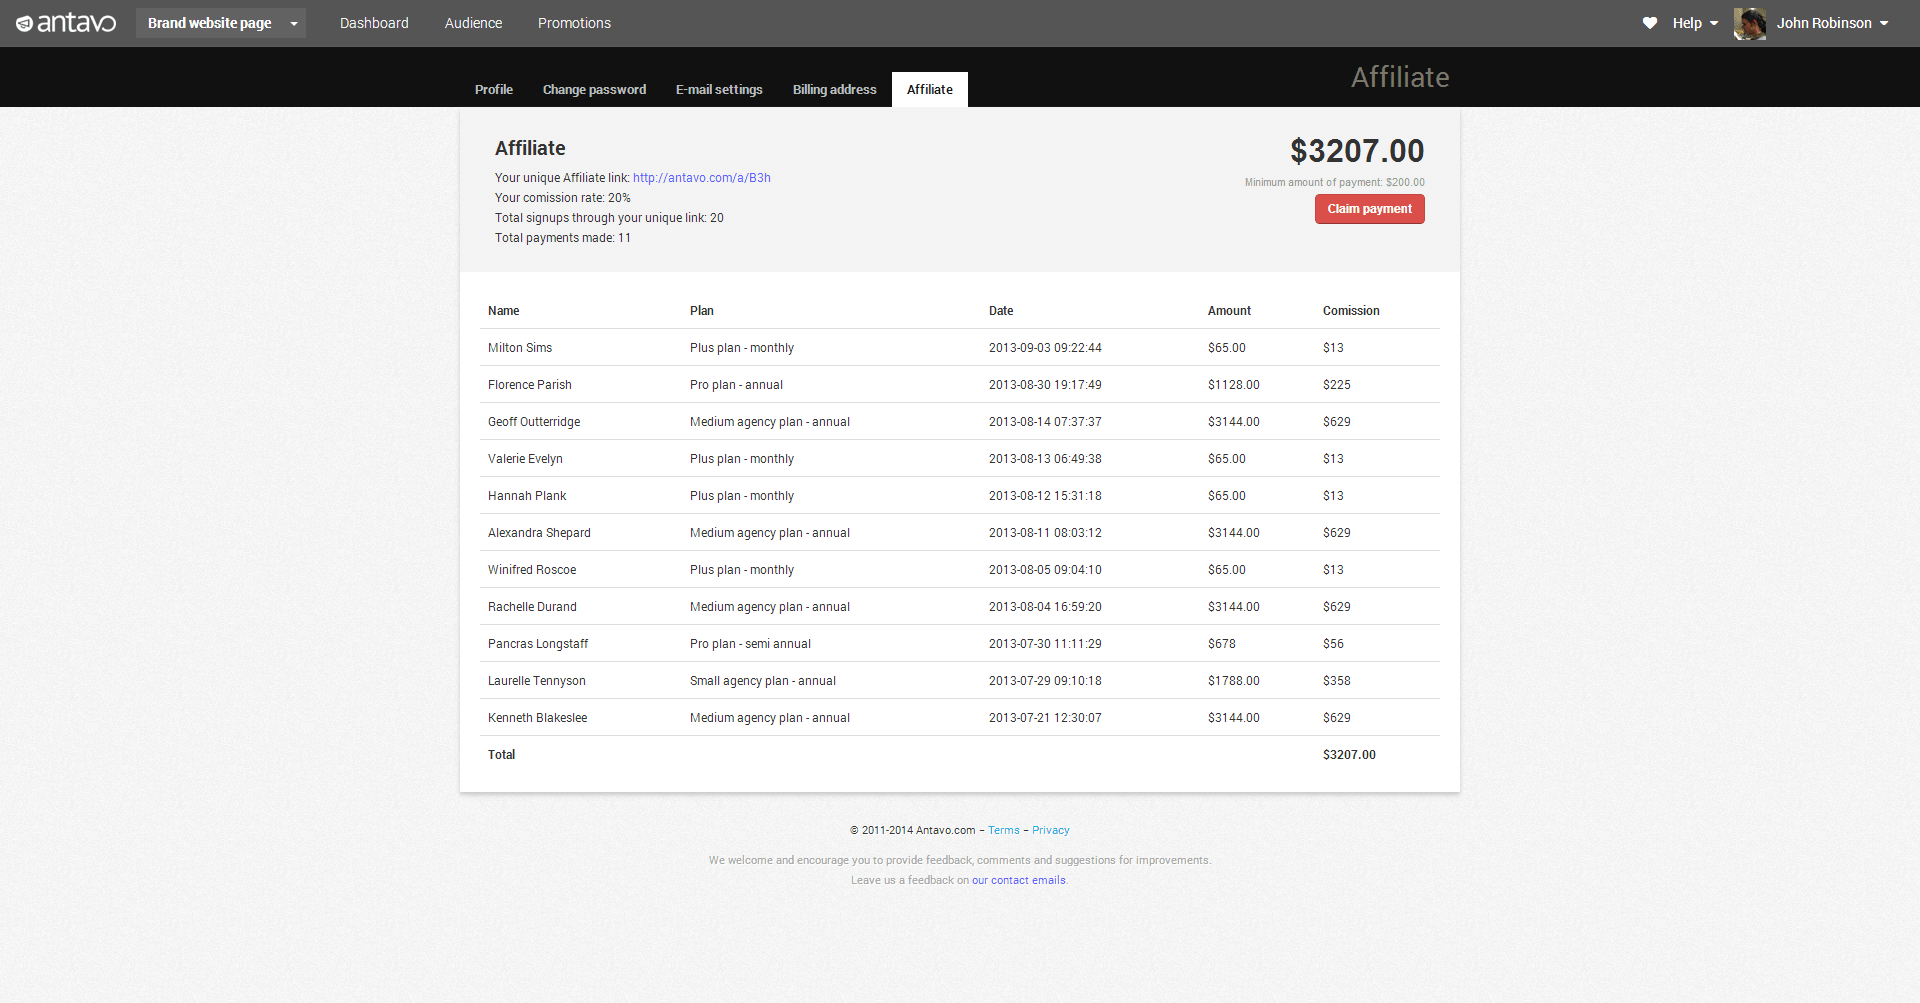 Affiliate page screenshot